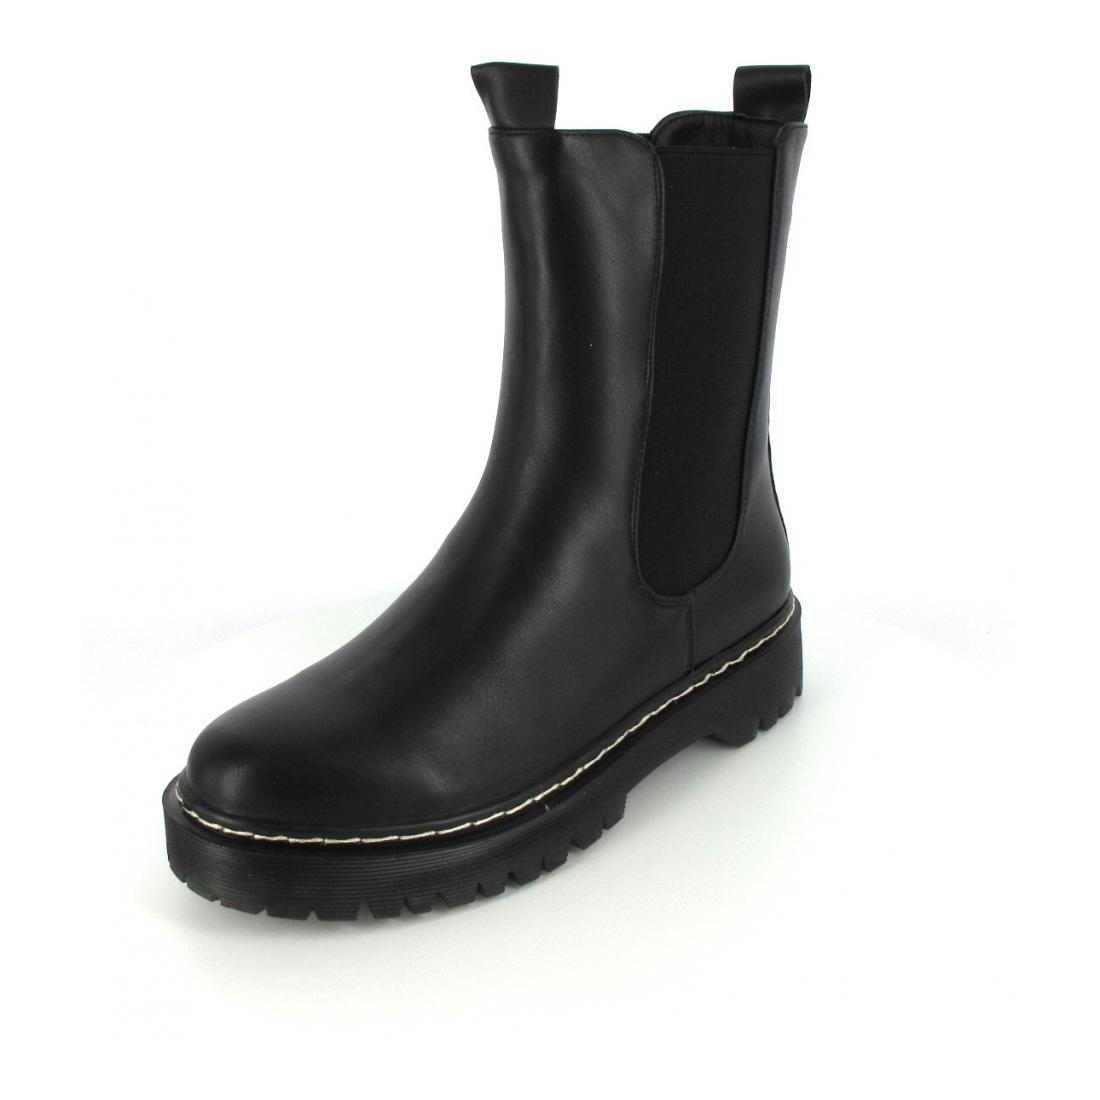 La Strada Chelsea Boot